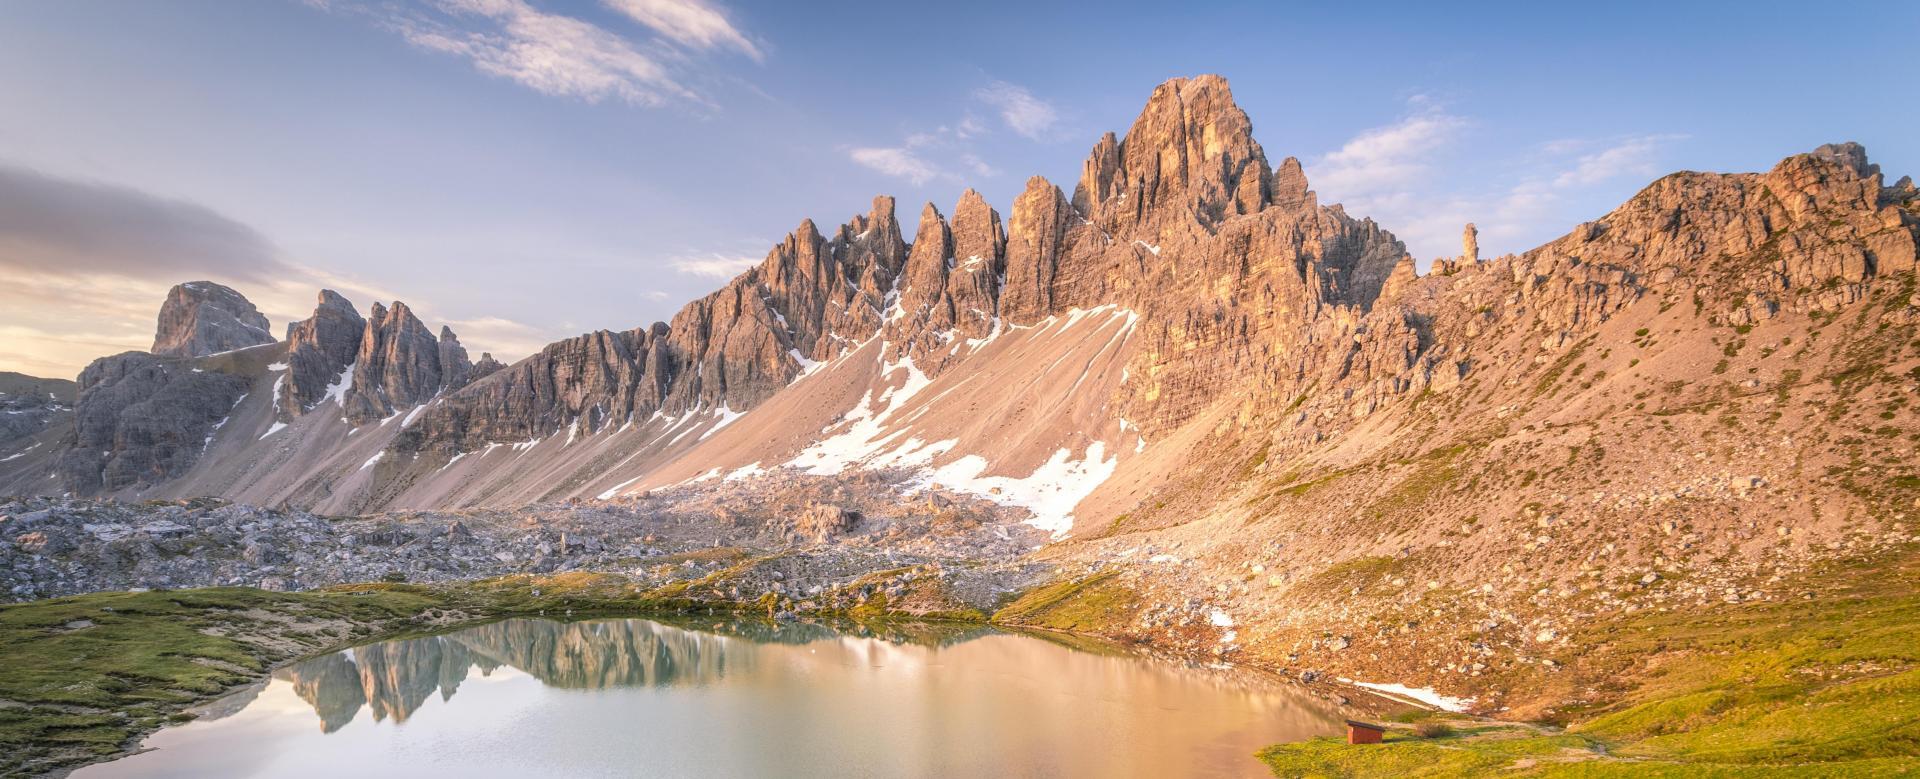 Voyage à pied Italie : Dolomites, citadelles alpines